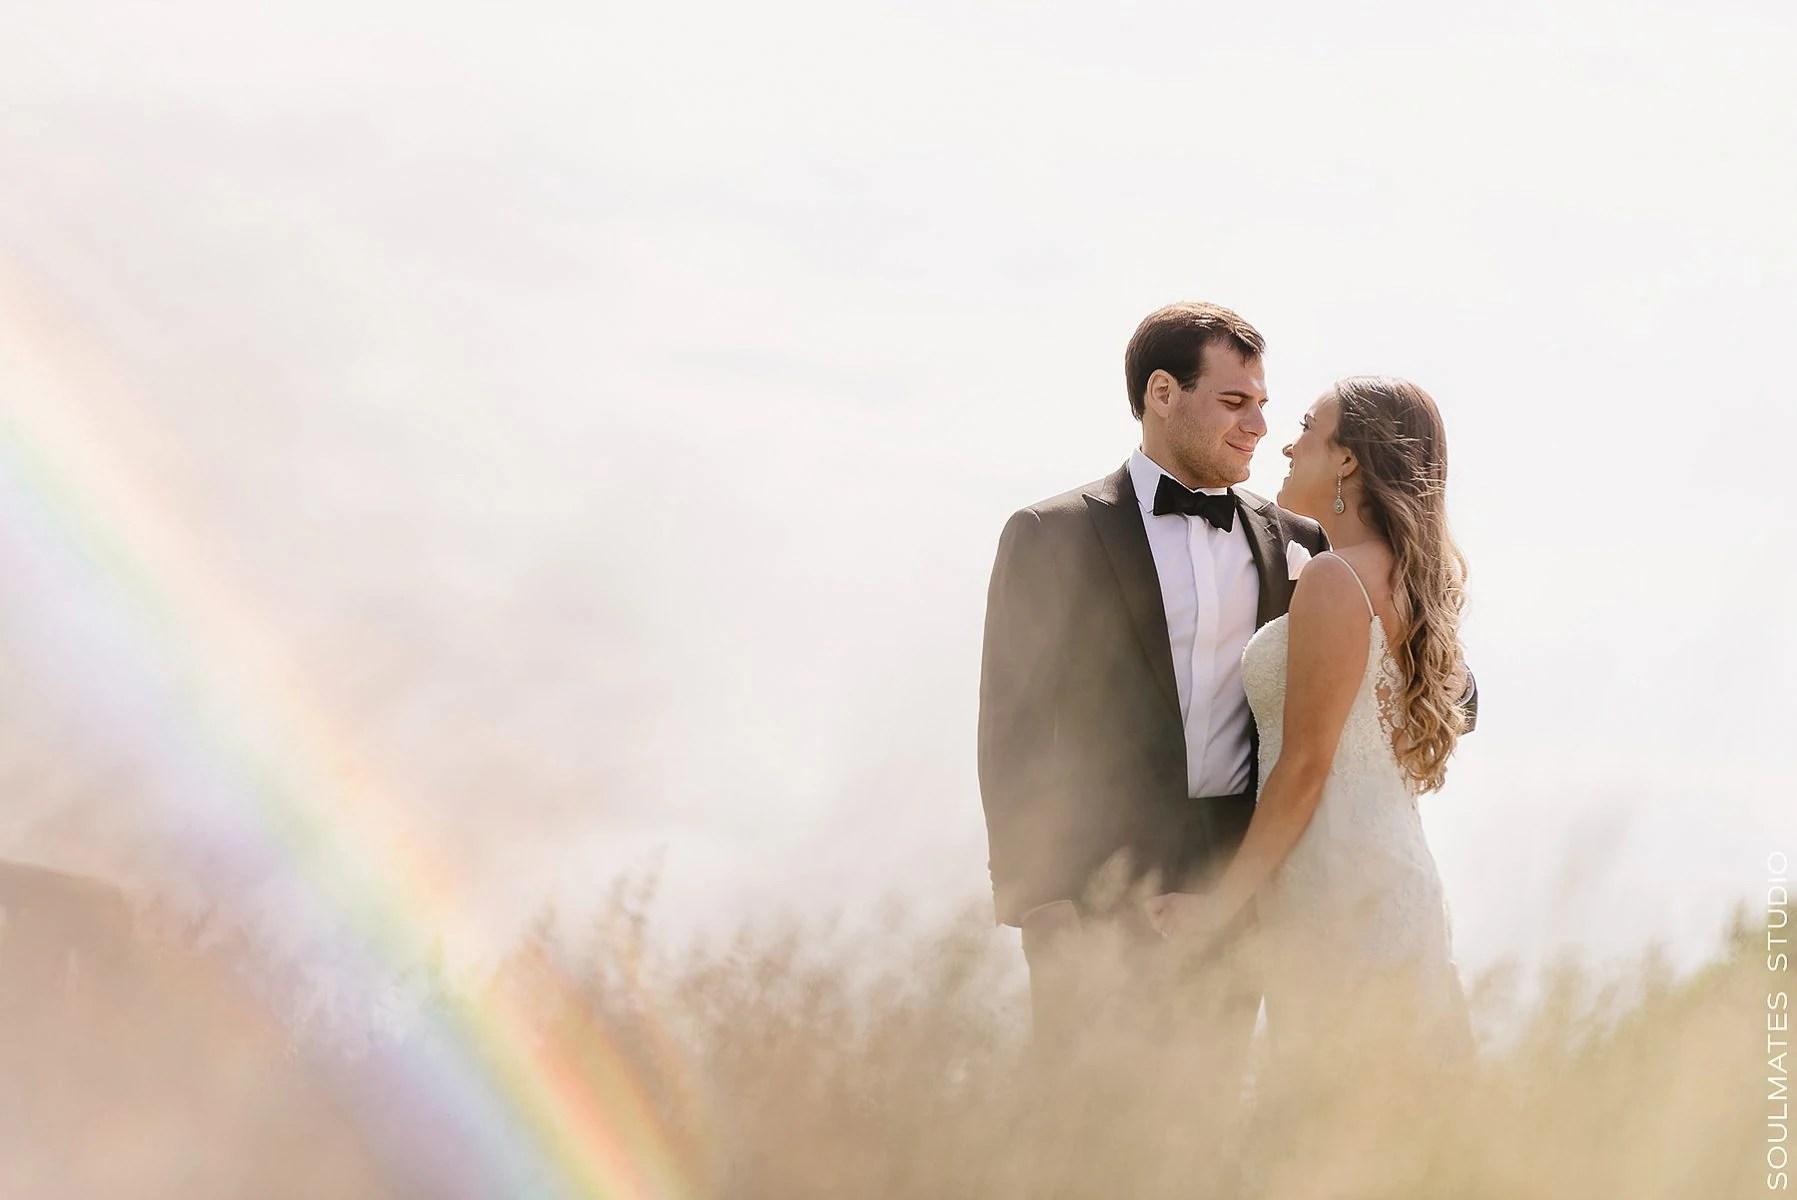 Fresh Meadow Country Club Bride and Groom Wedding Portrait